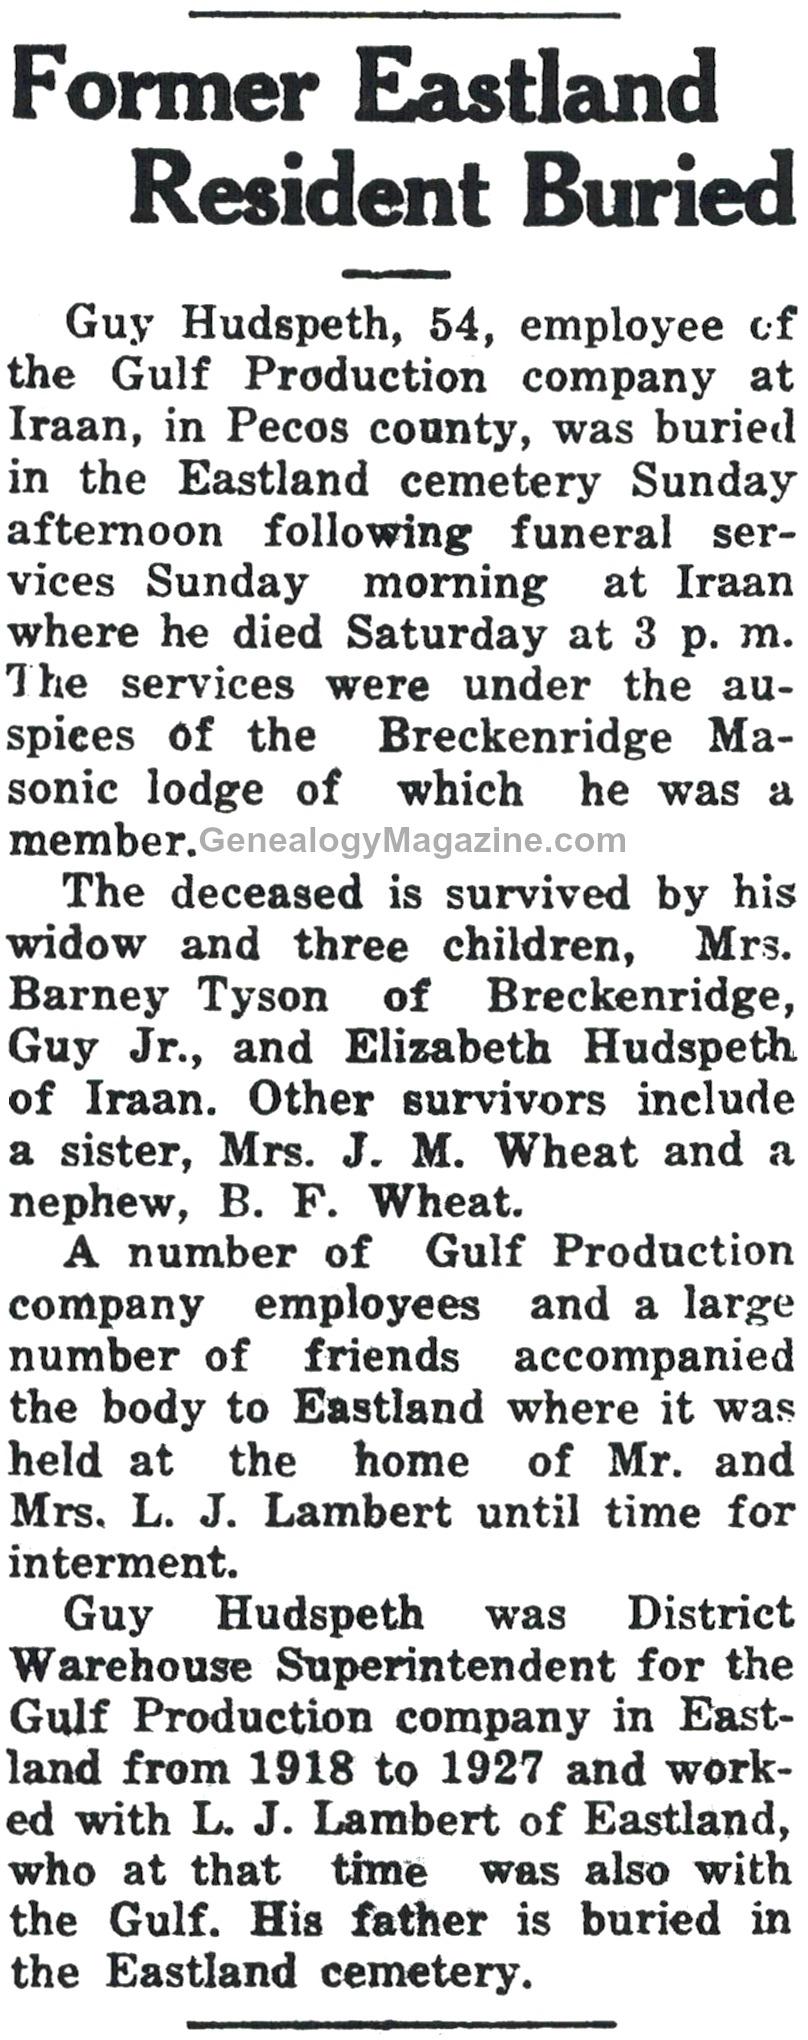 HUDSPETH, Guy obituary